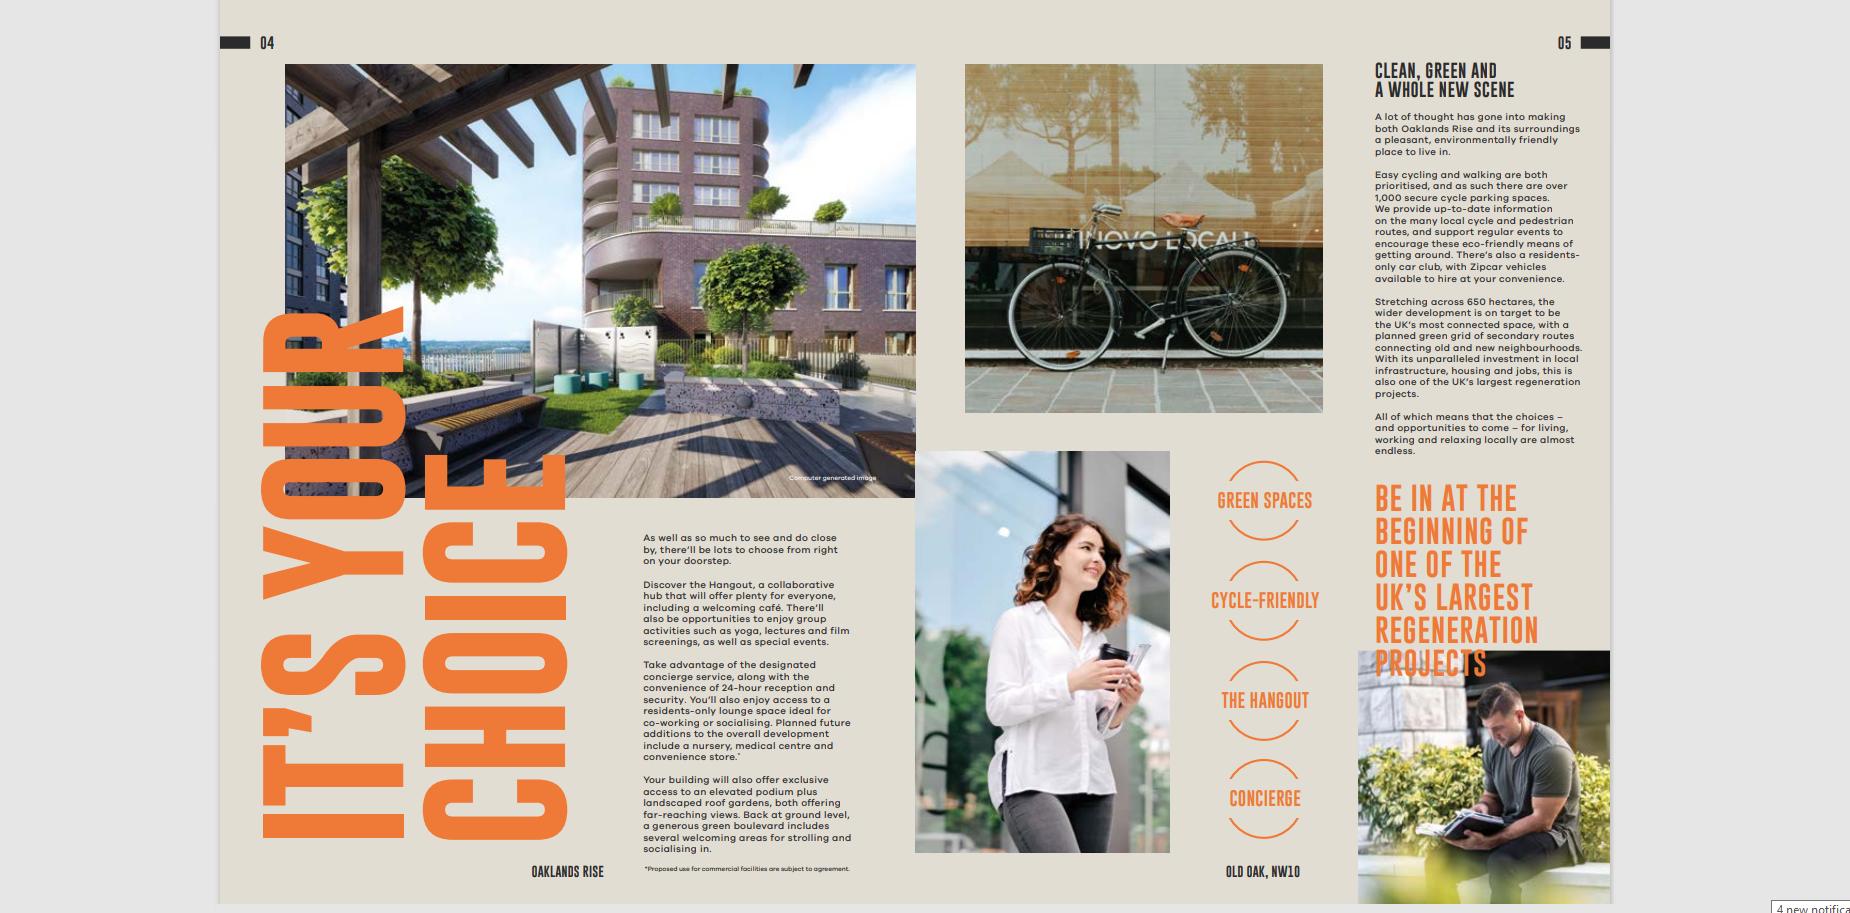 Oaklands Rise property brochure